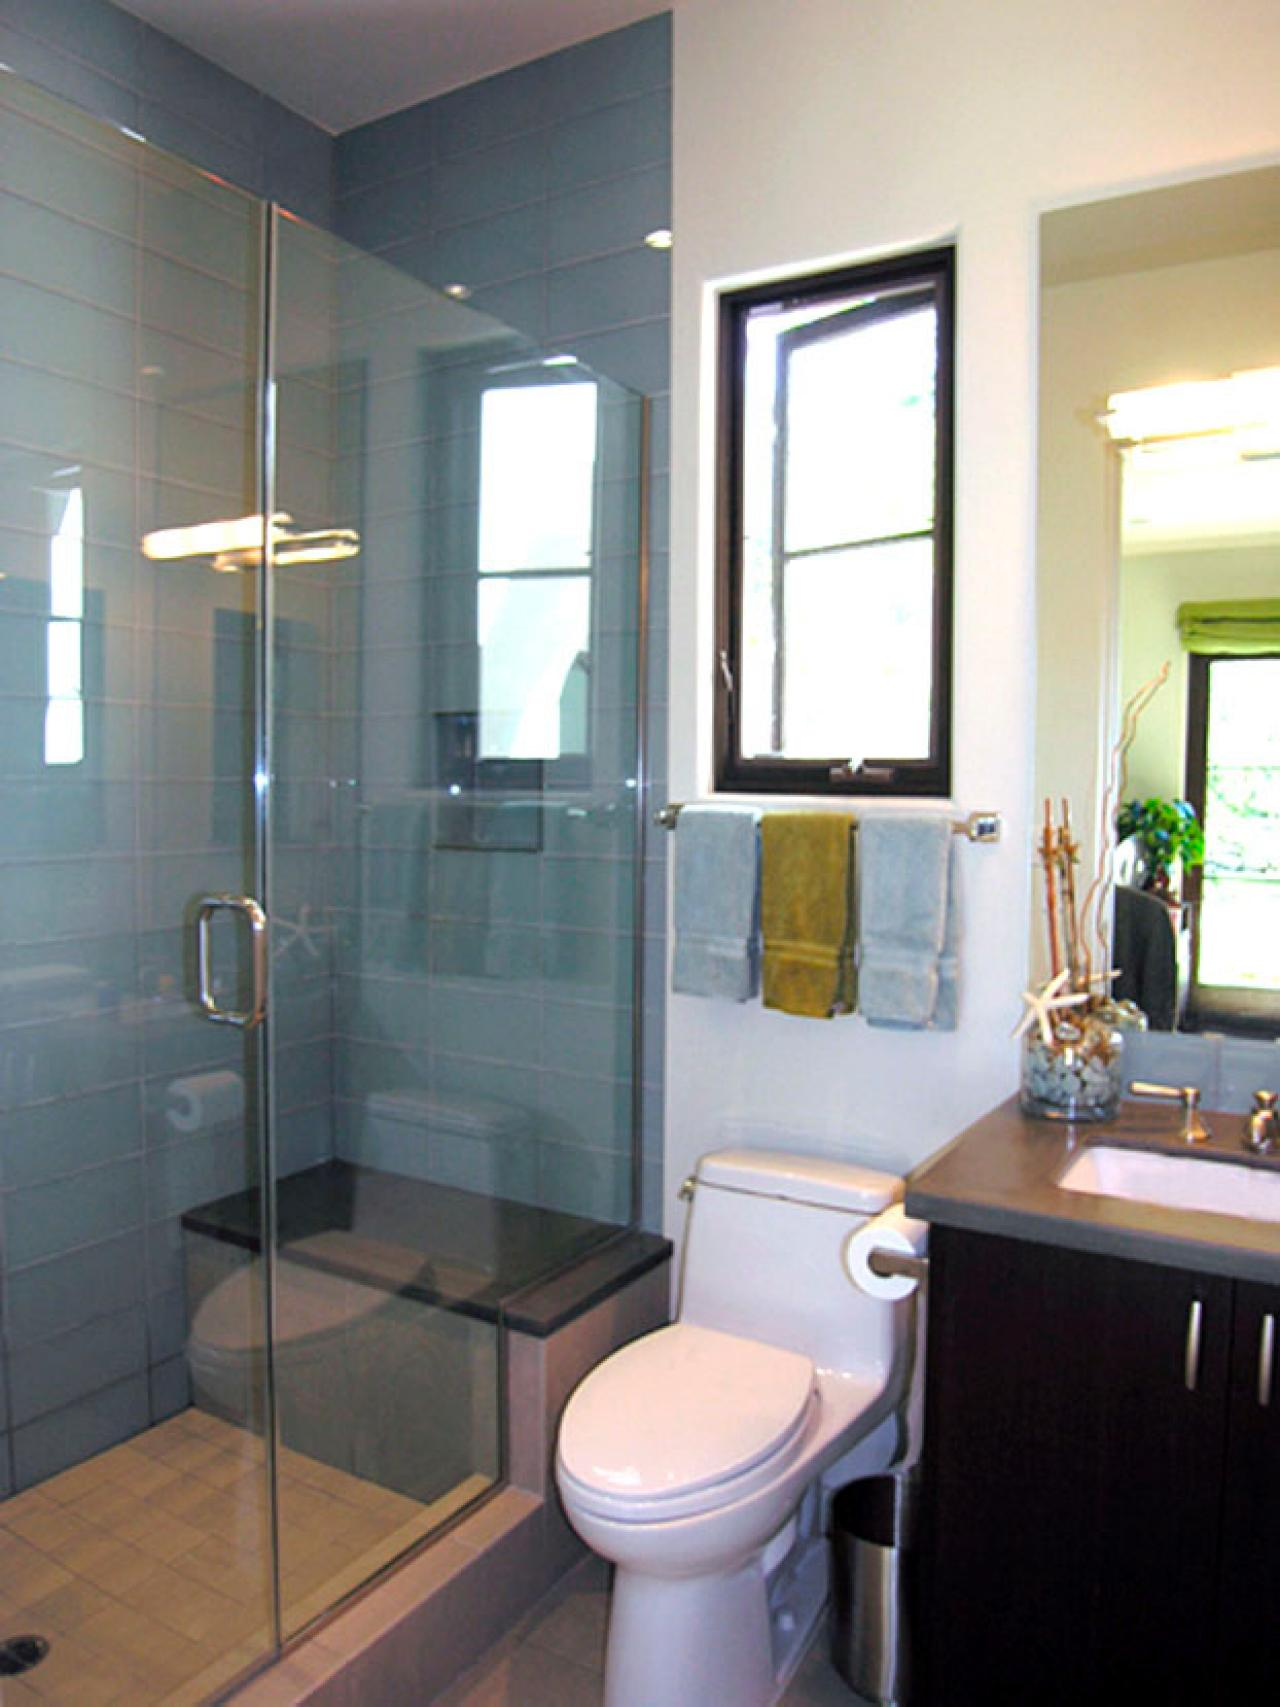 5 Tub and Shower Storage Tips | HGTV